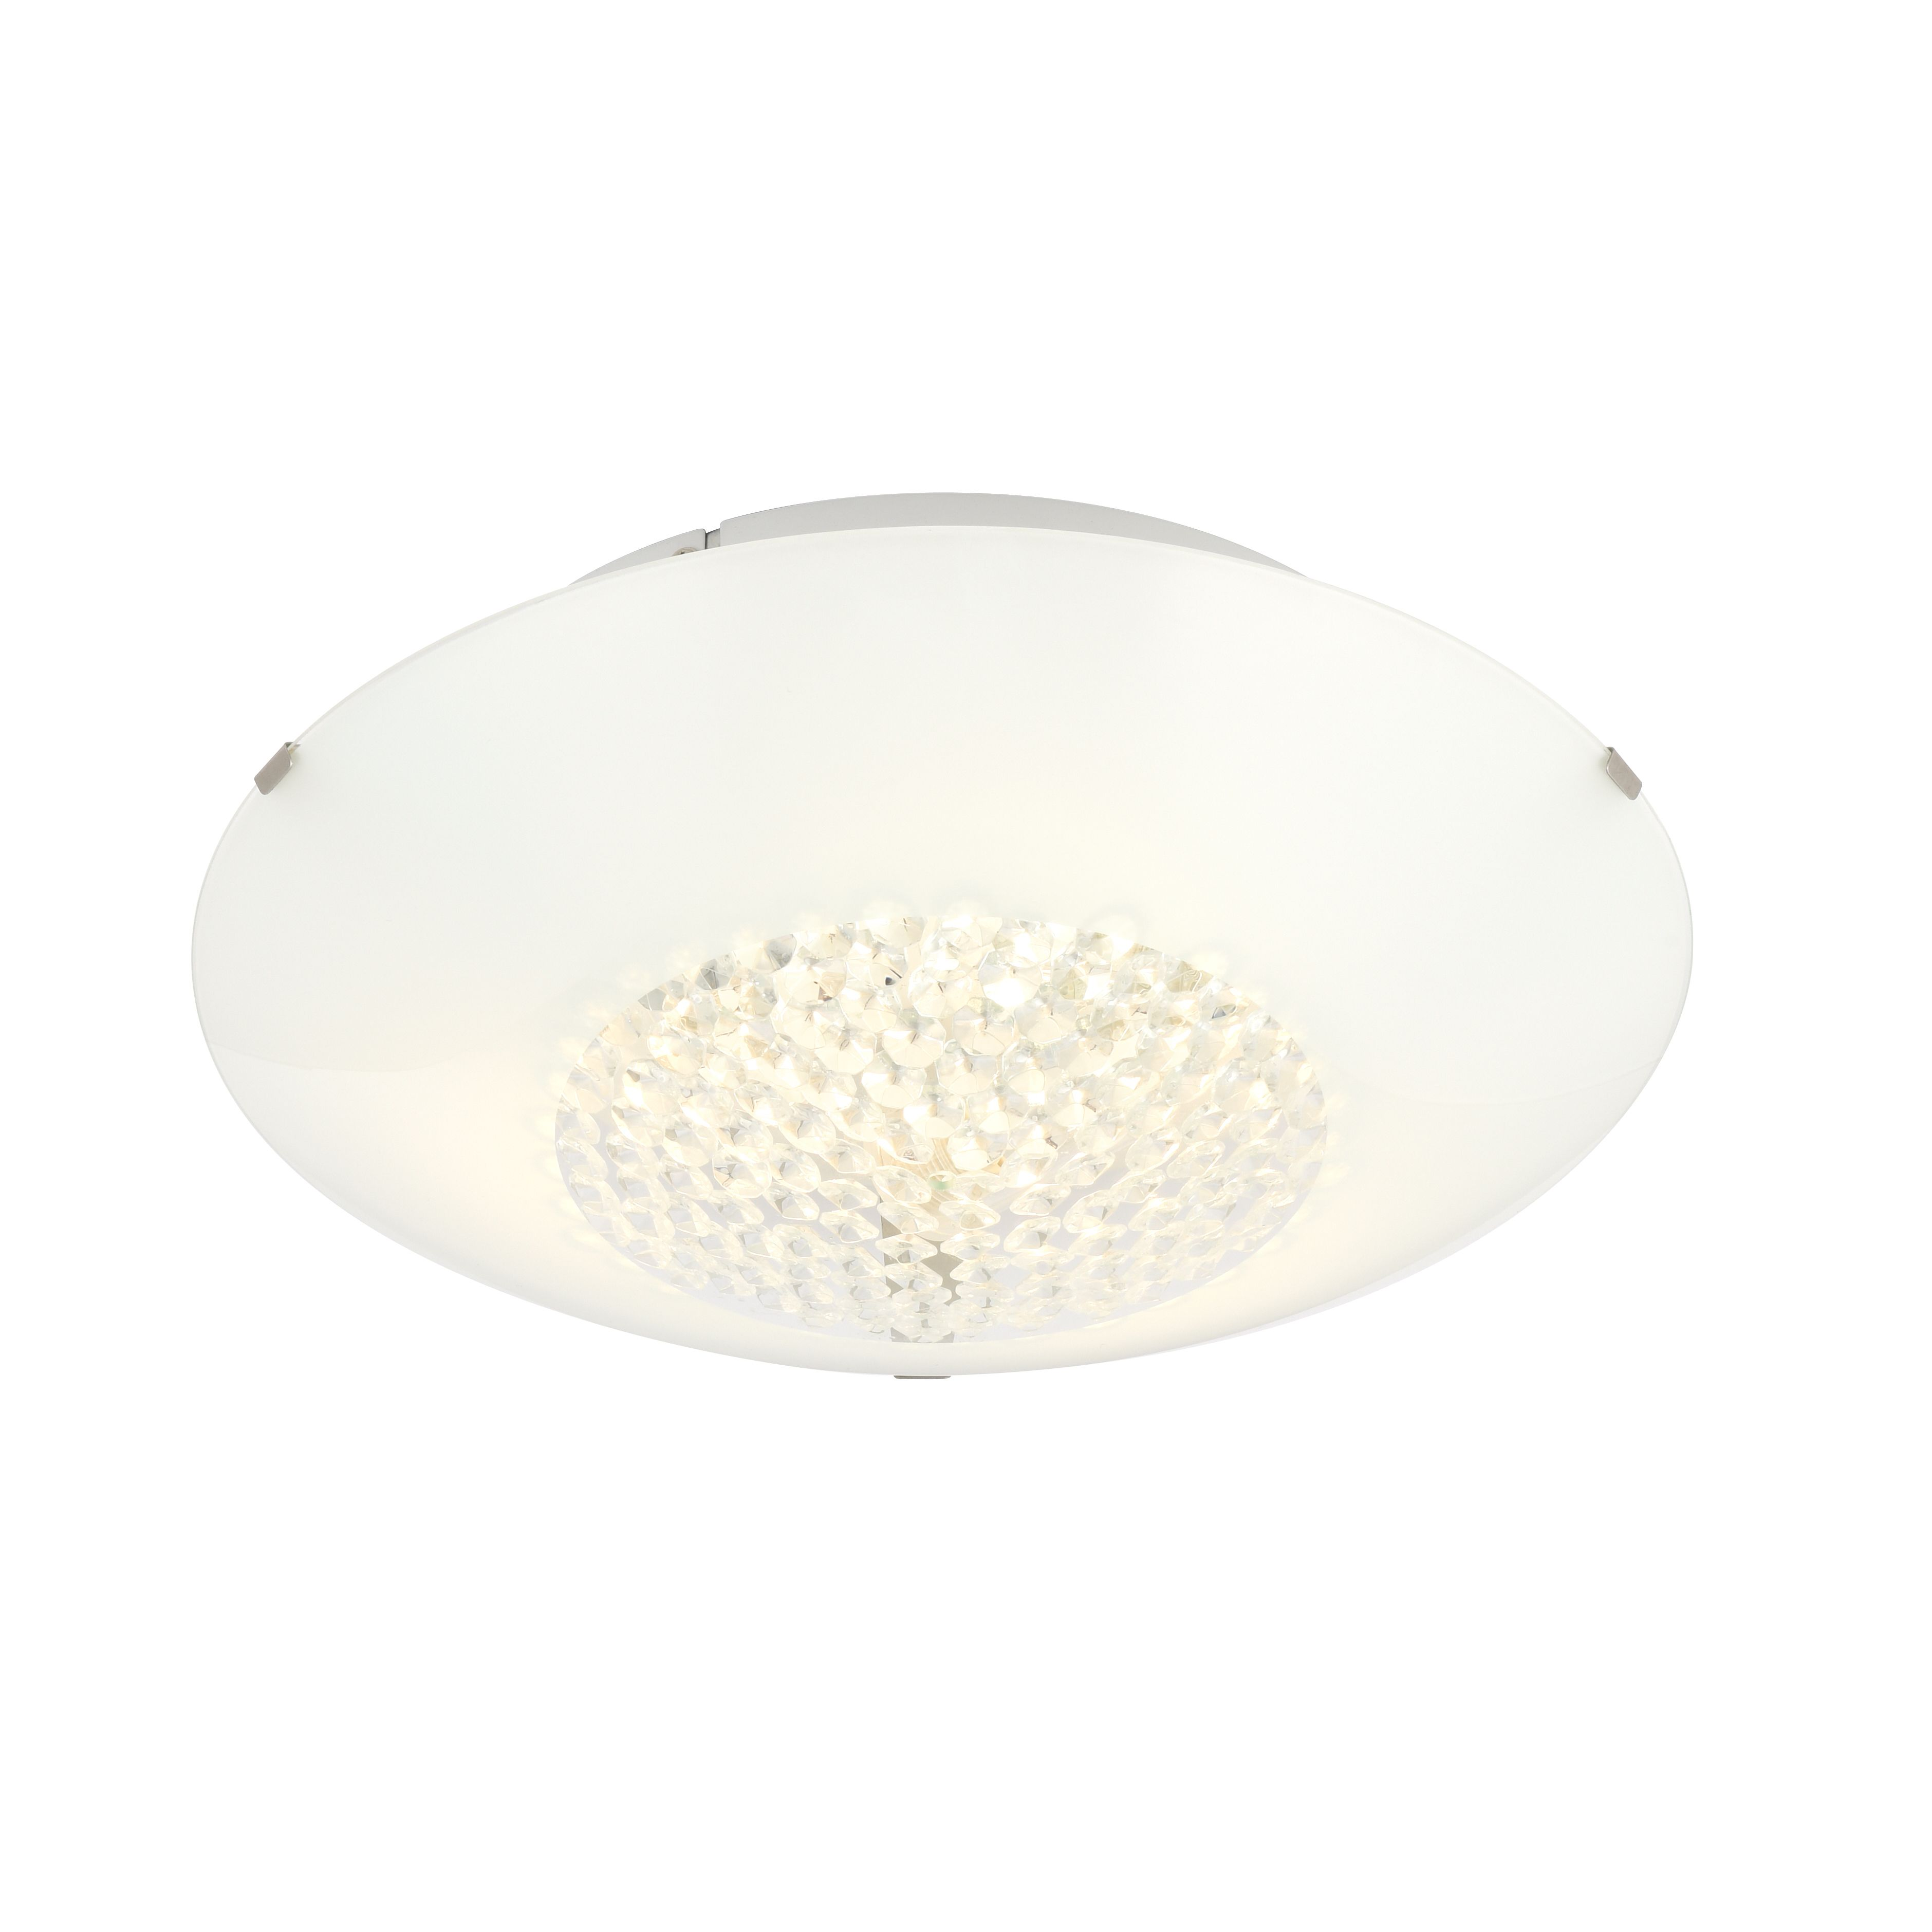 Drop ceiling lighting fixtures - Crystallinity Crystal White 3 Lamp Flush Bathroom Ceiling Light